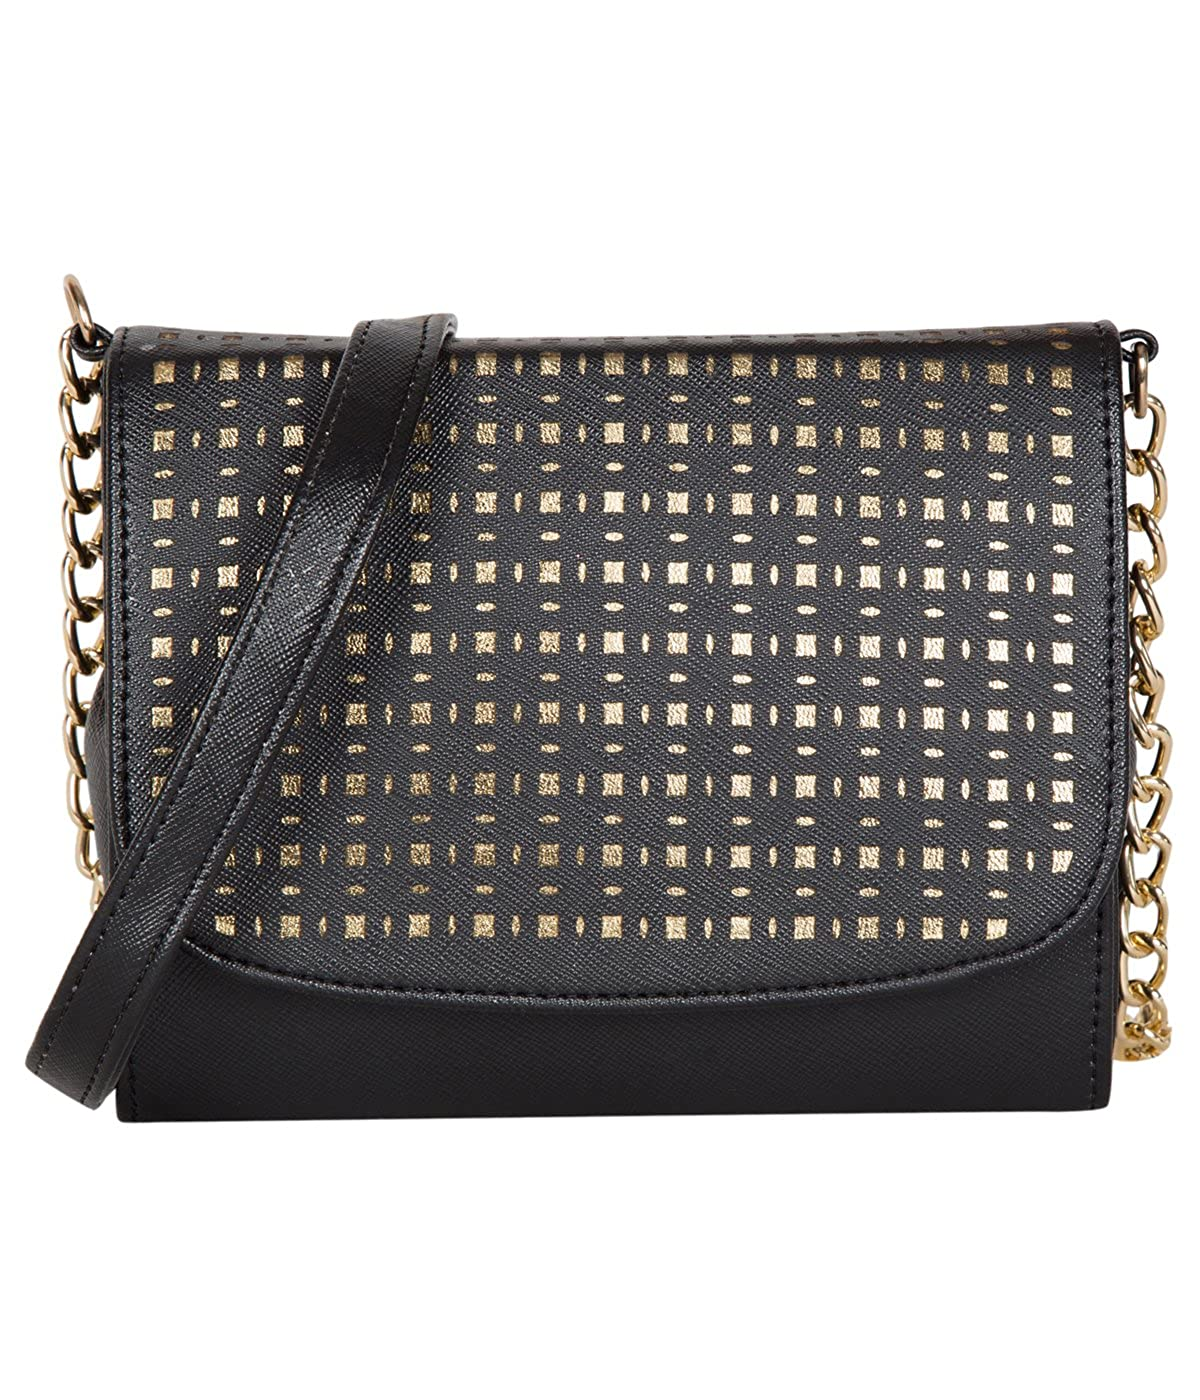 60479fdef9c ADISA SL5010 black women girls party sling bag  Amazon.in  Shoes   Handbags